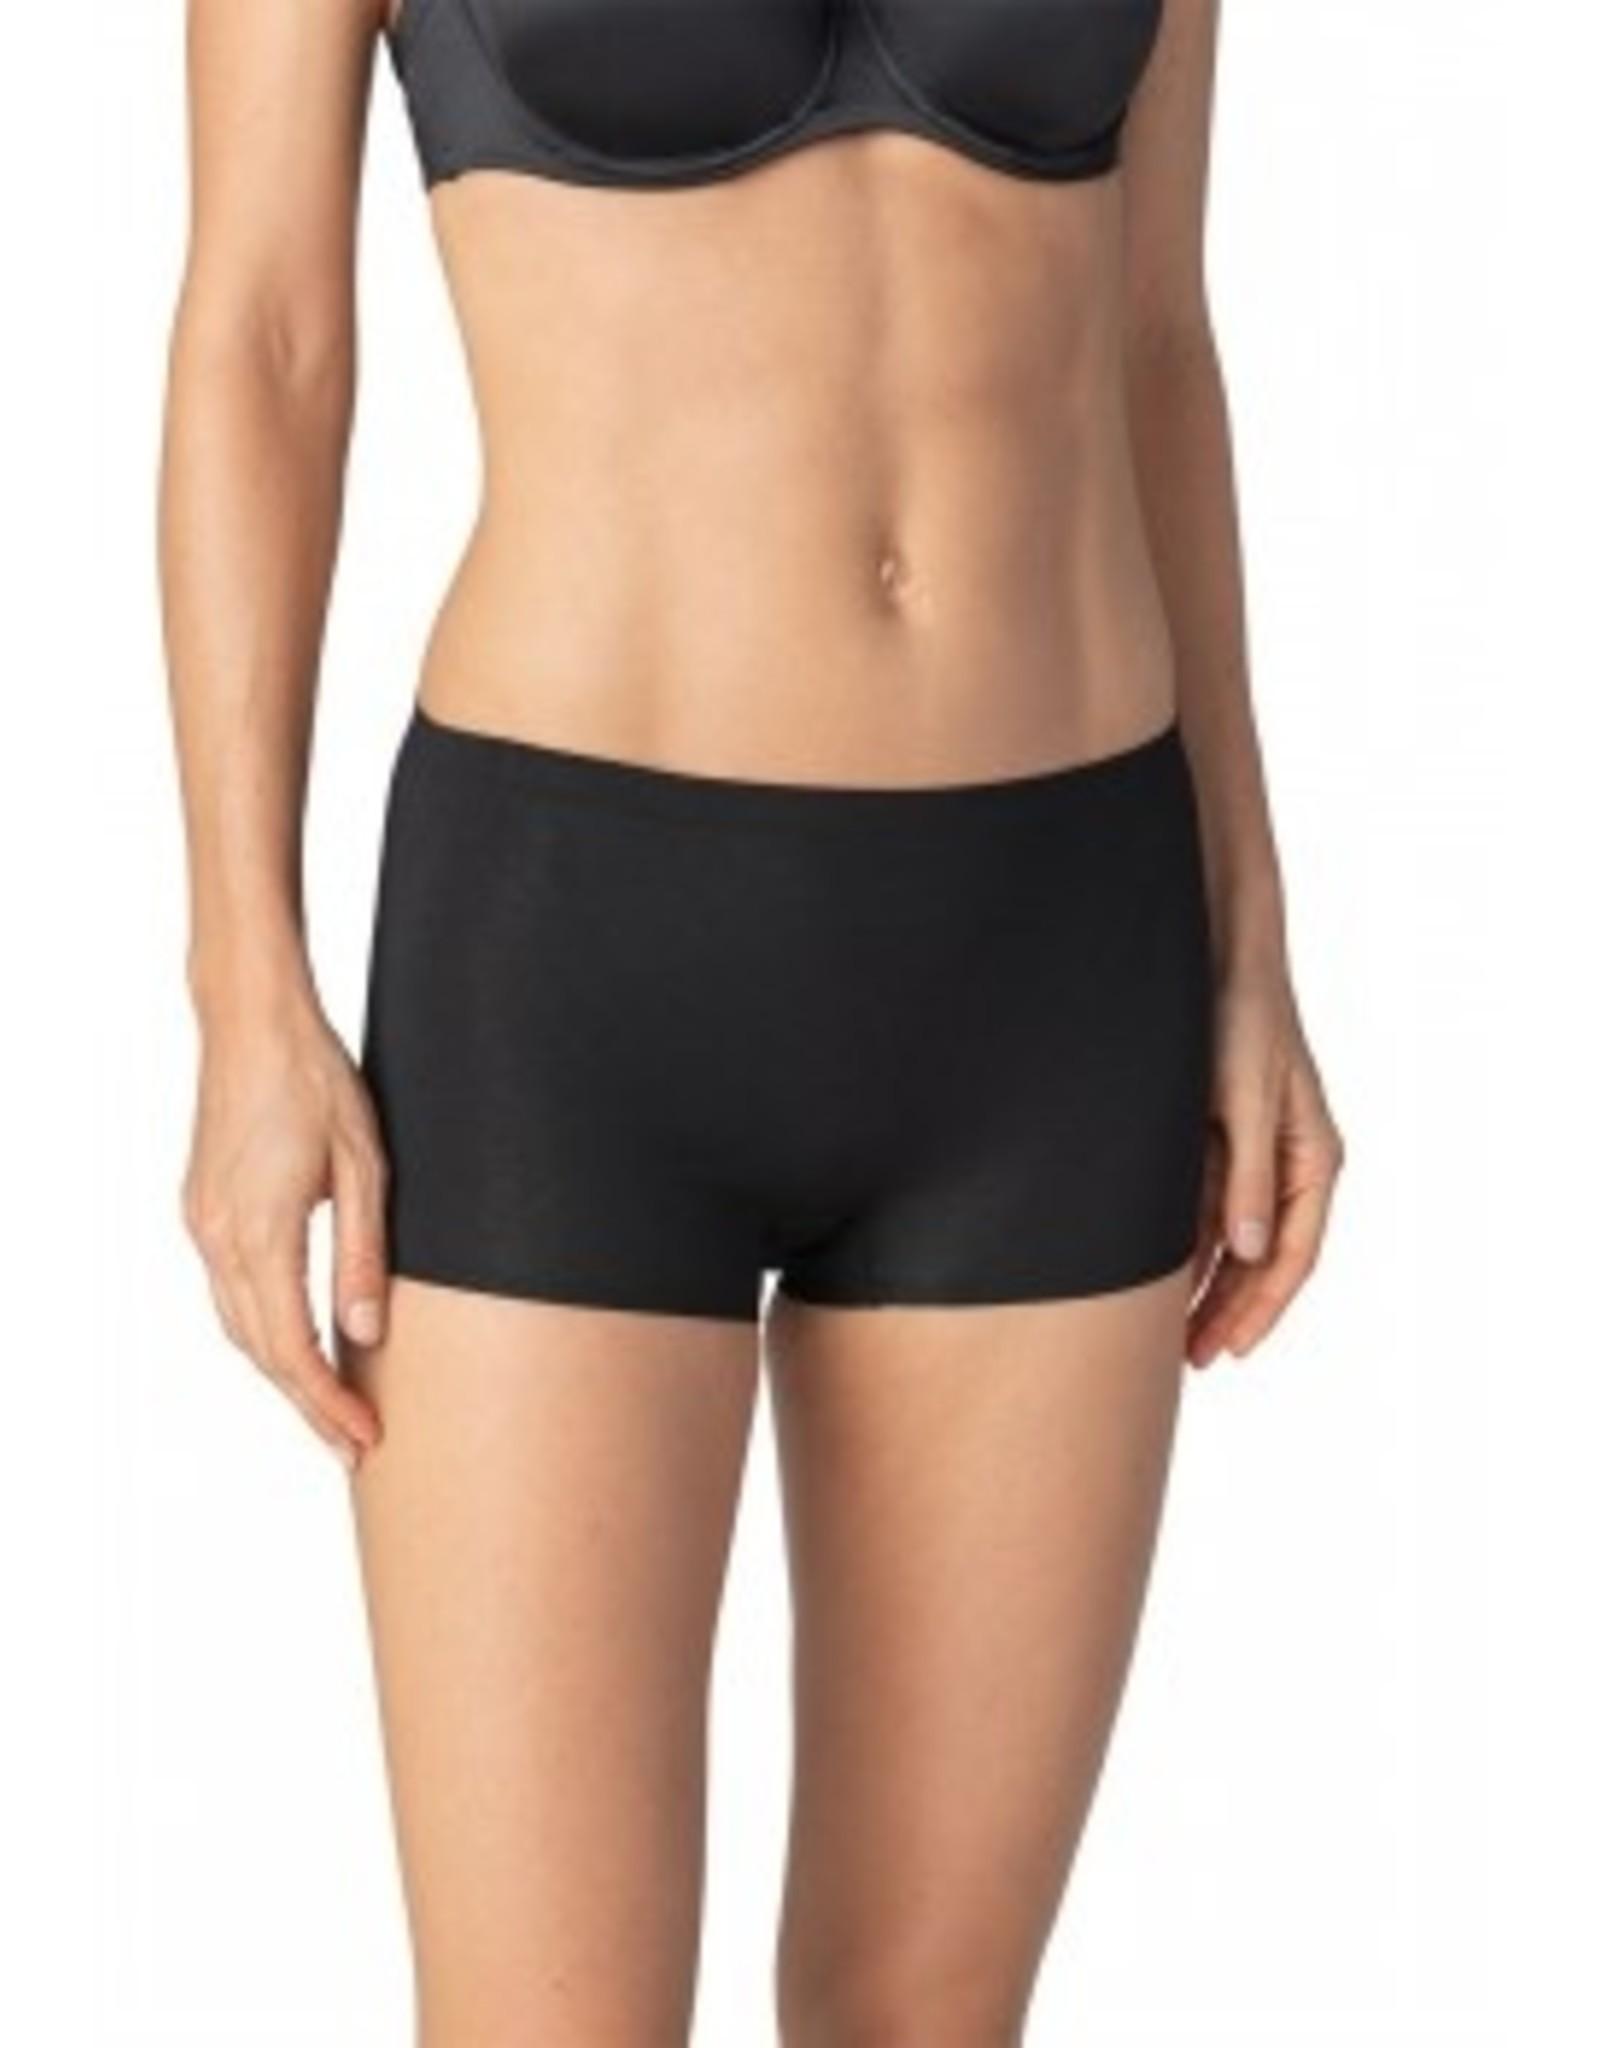 Mey Natural Second Me, shorts, black